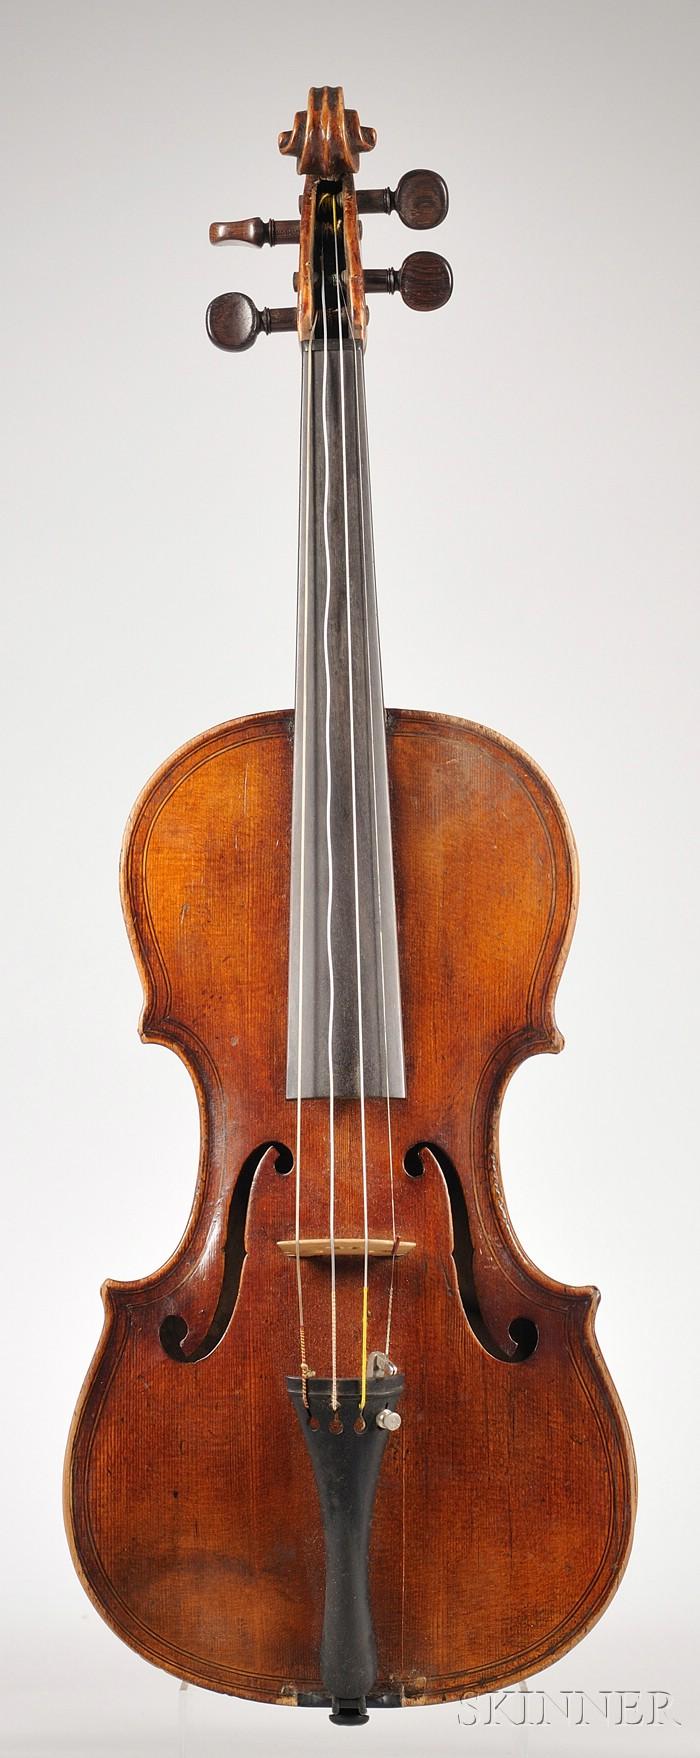 French Violin c. 1860